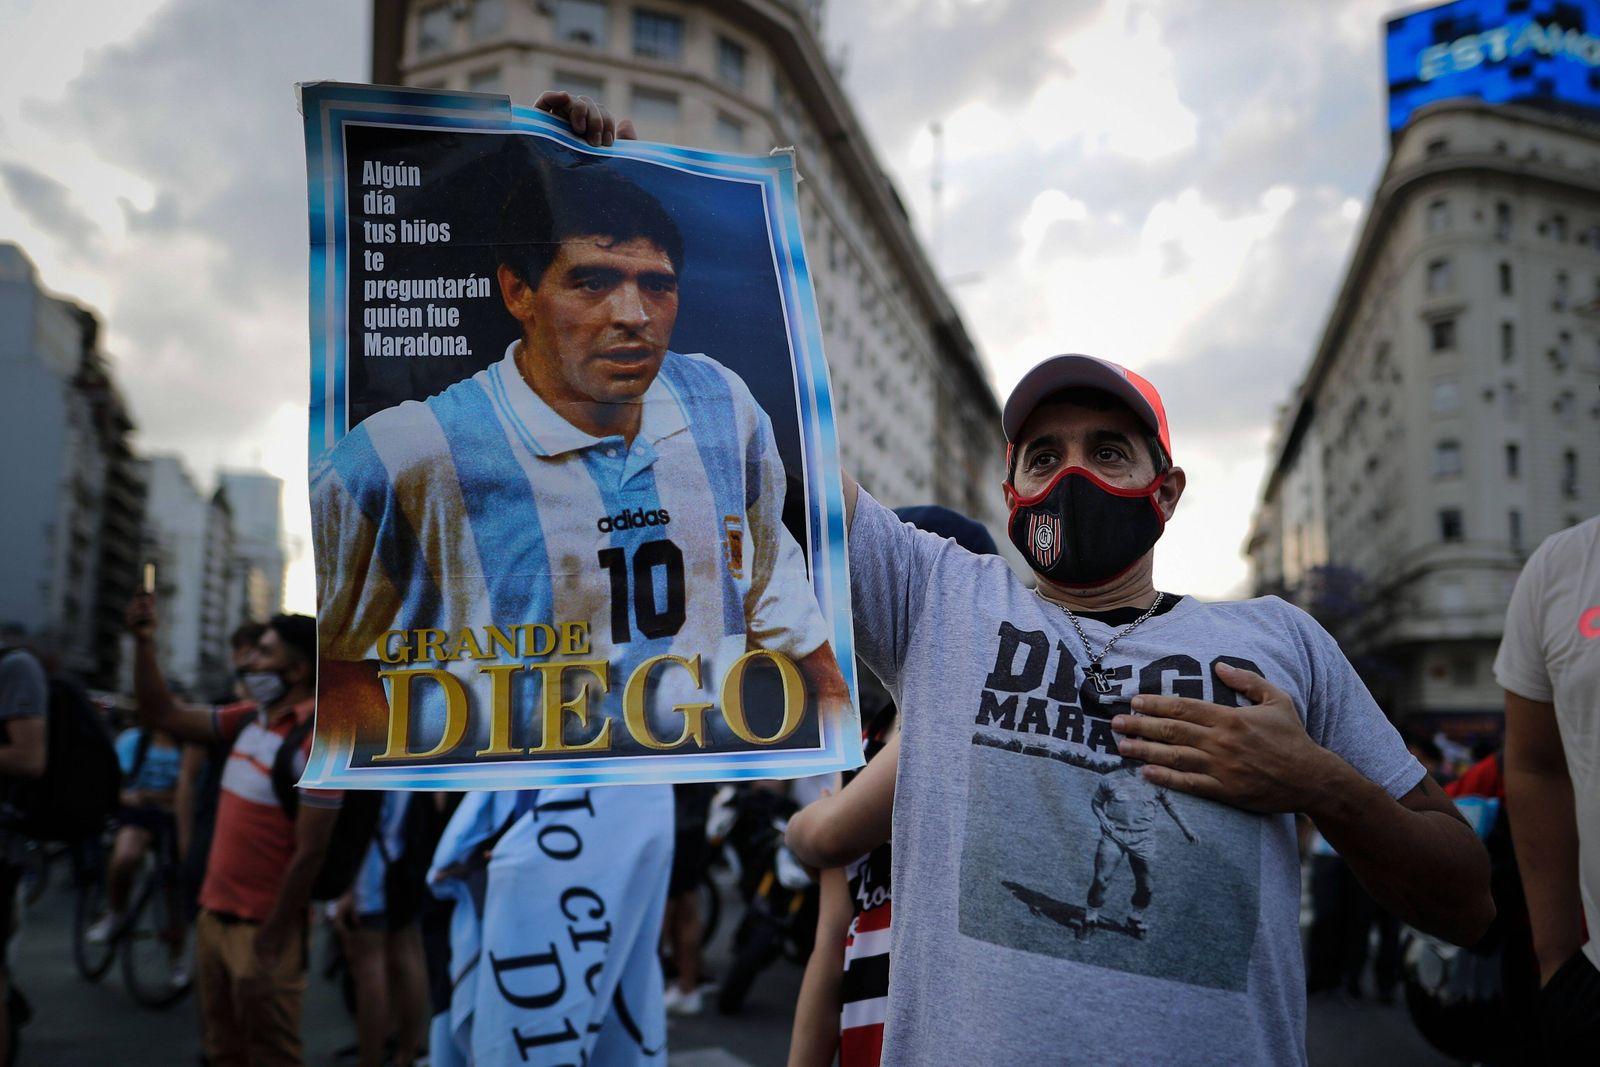 Argentinien, Trauer um Diego Armando Maradona Hundreds of people gather at the Obelisk to say goodbye to Diego Armando M